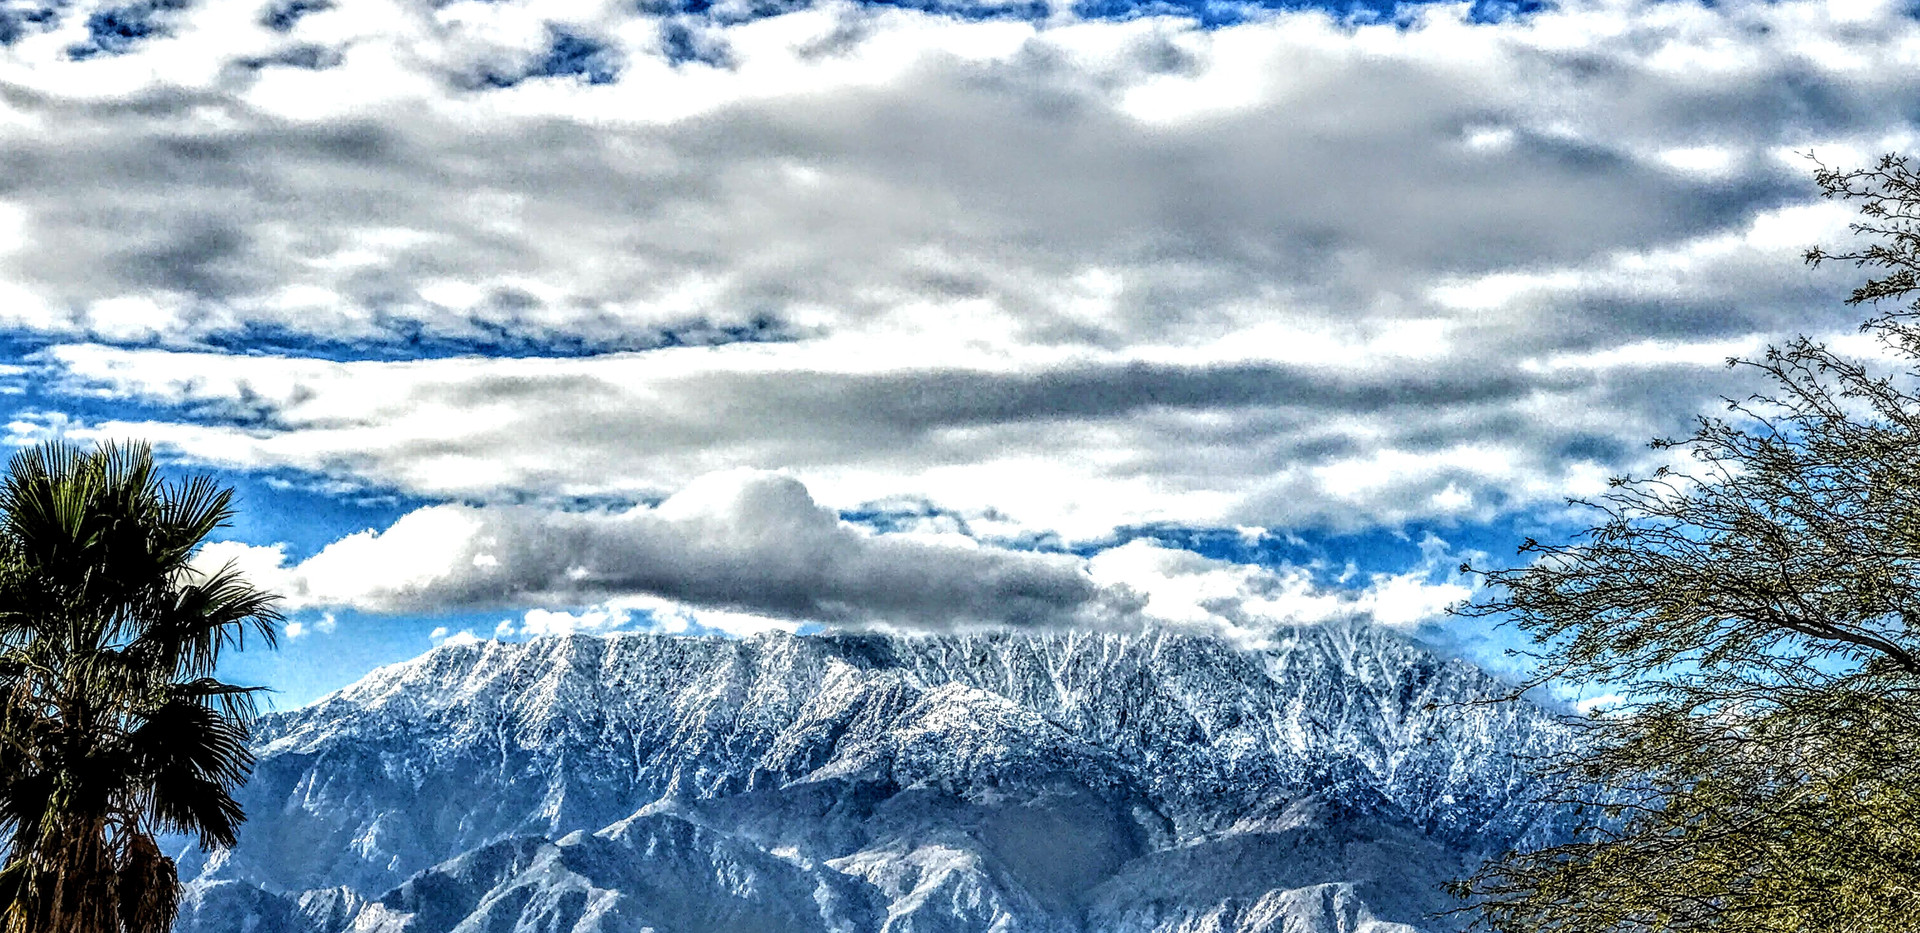 10-Mountain.jpg